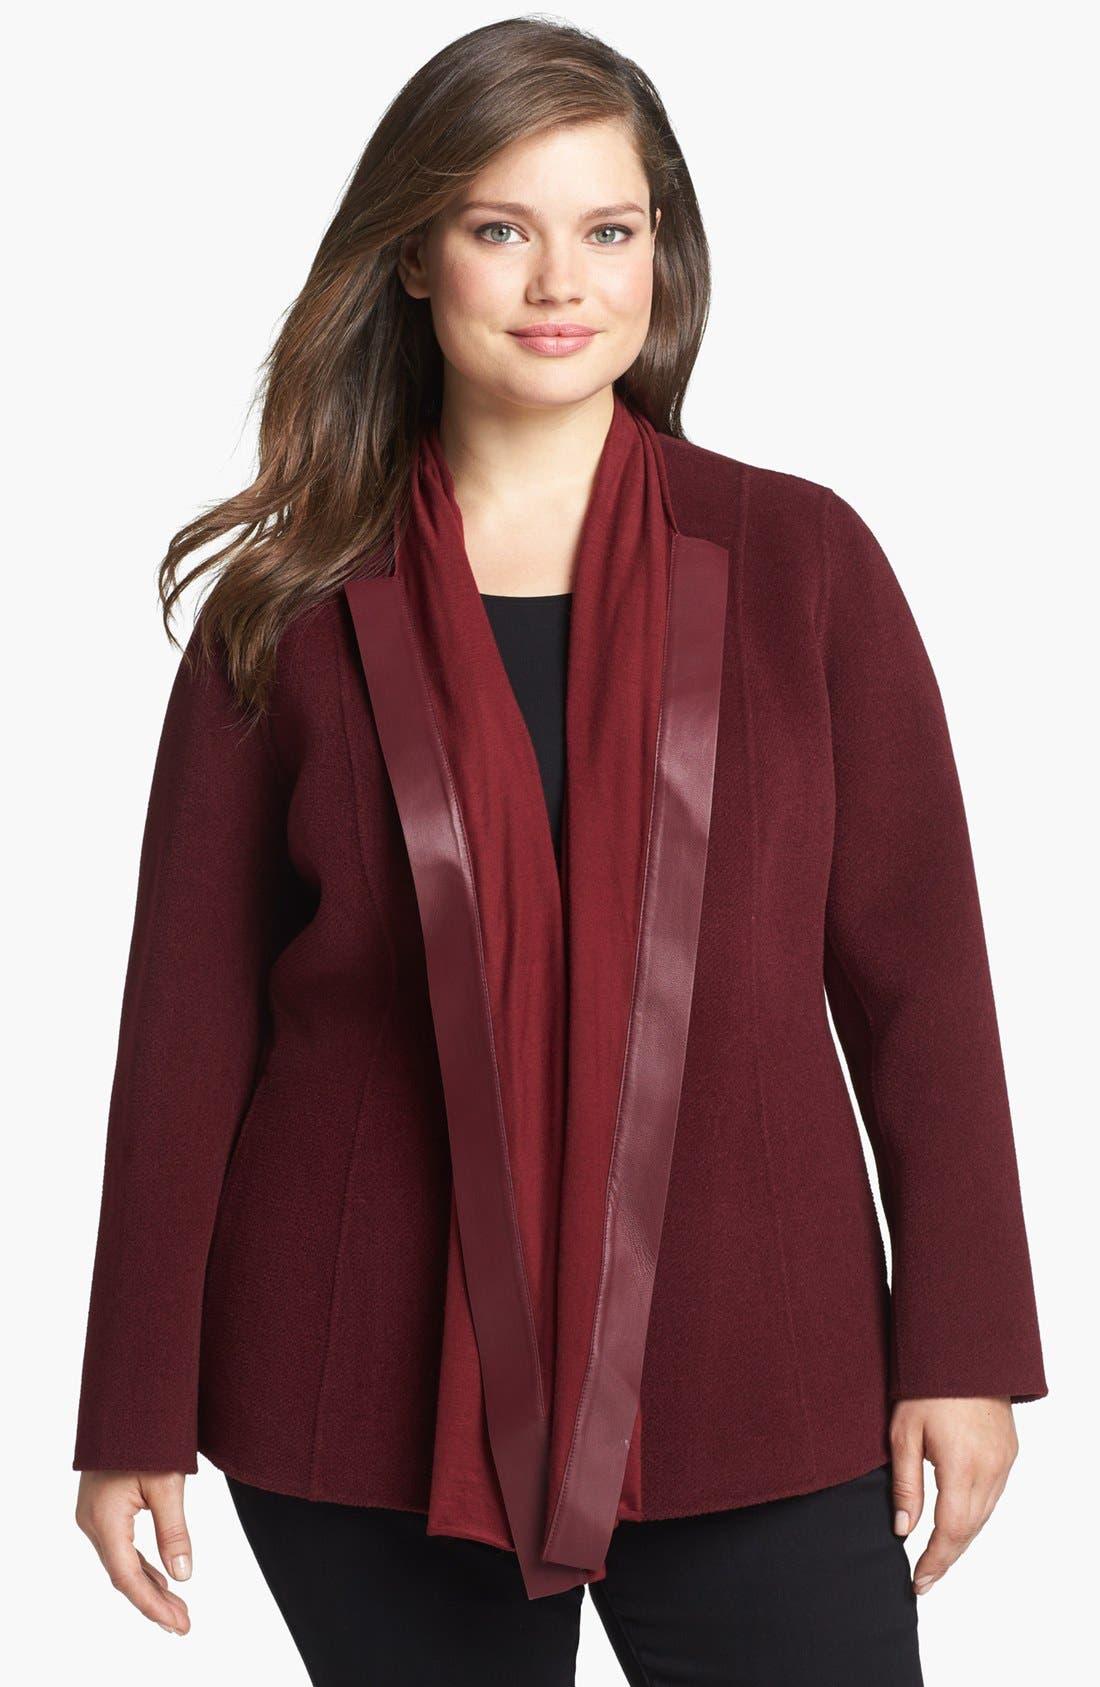 Main Image - Lafayette 148 New York 'Alessa' Leather Trim Wool & Angora Jacket (Plus Size)